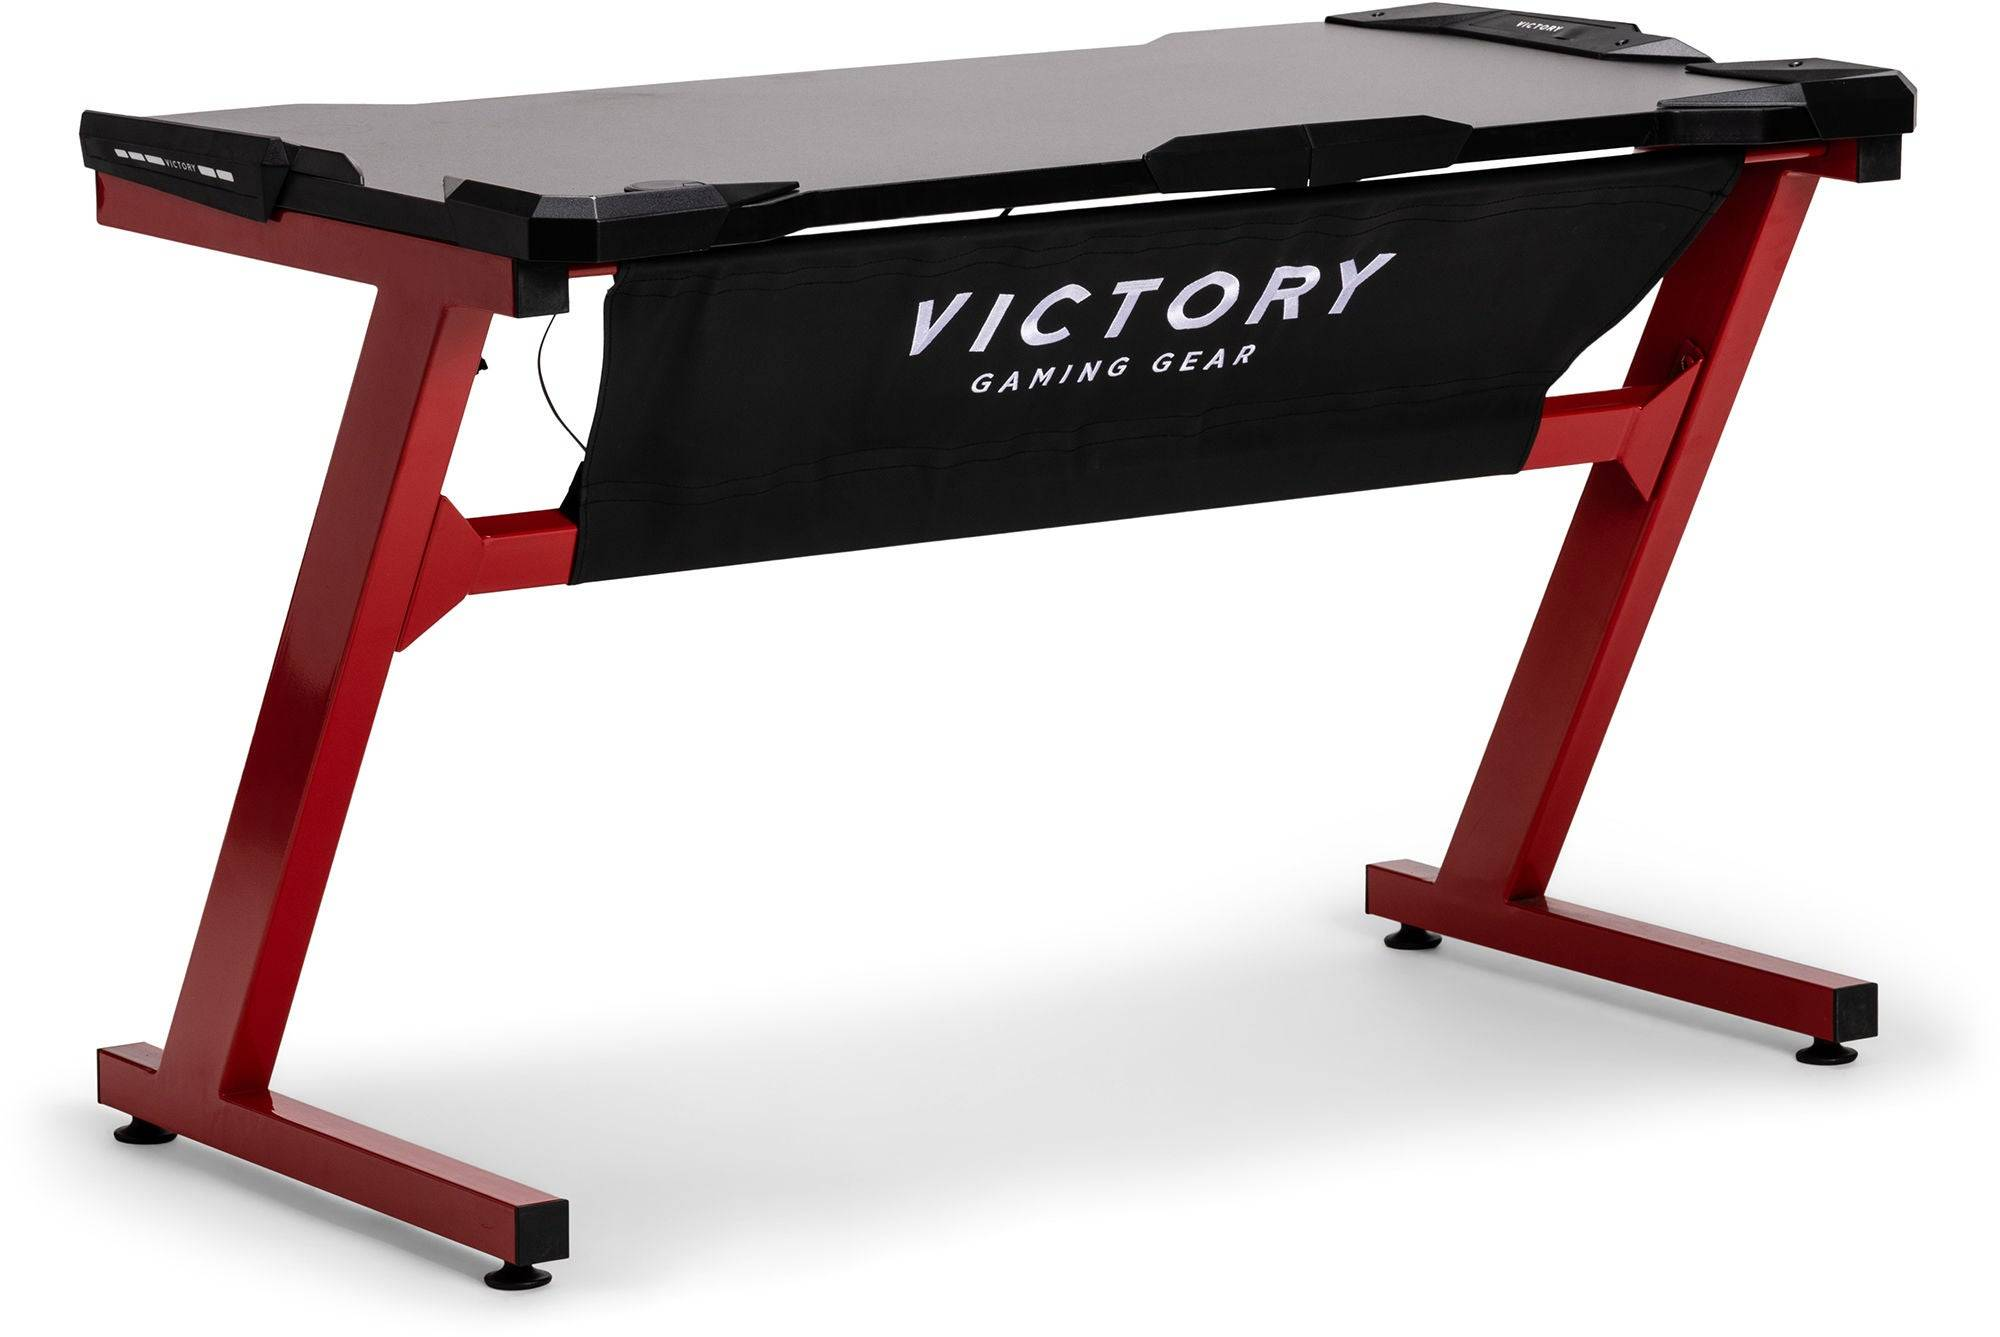 Victory Z1 Pro Gamingbord, Rød